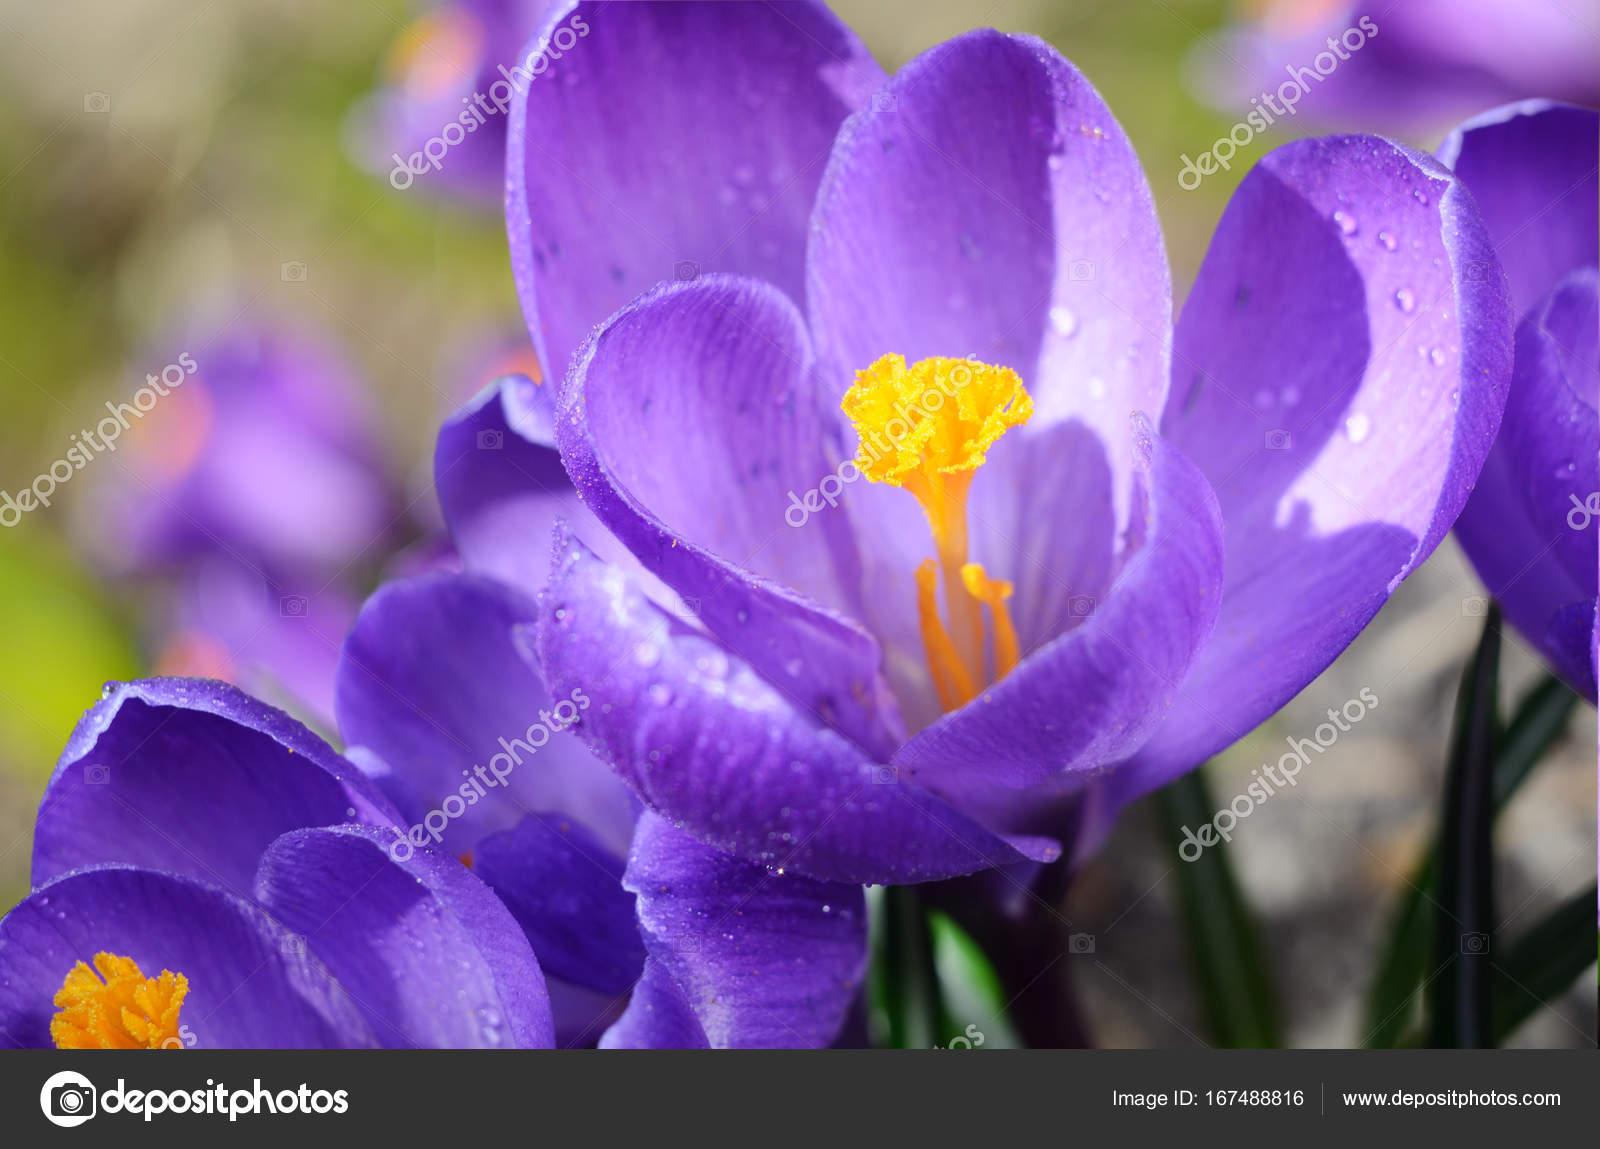 Beautiful first spring flowers crocuses bloom under bright sunlight beautiful first spring flowers crocuses bloom under bright sunlight spring holidays backdrop stock photo mightylinksfo